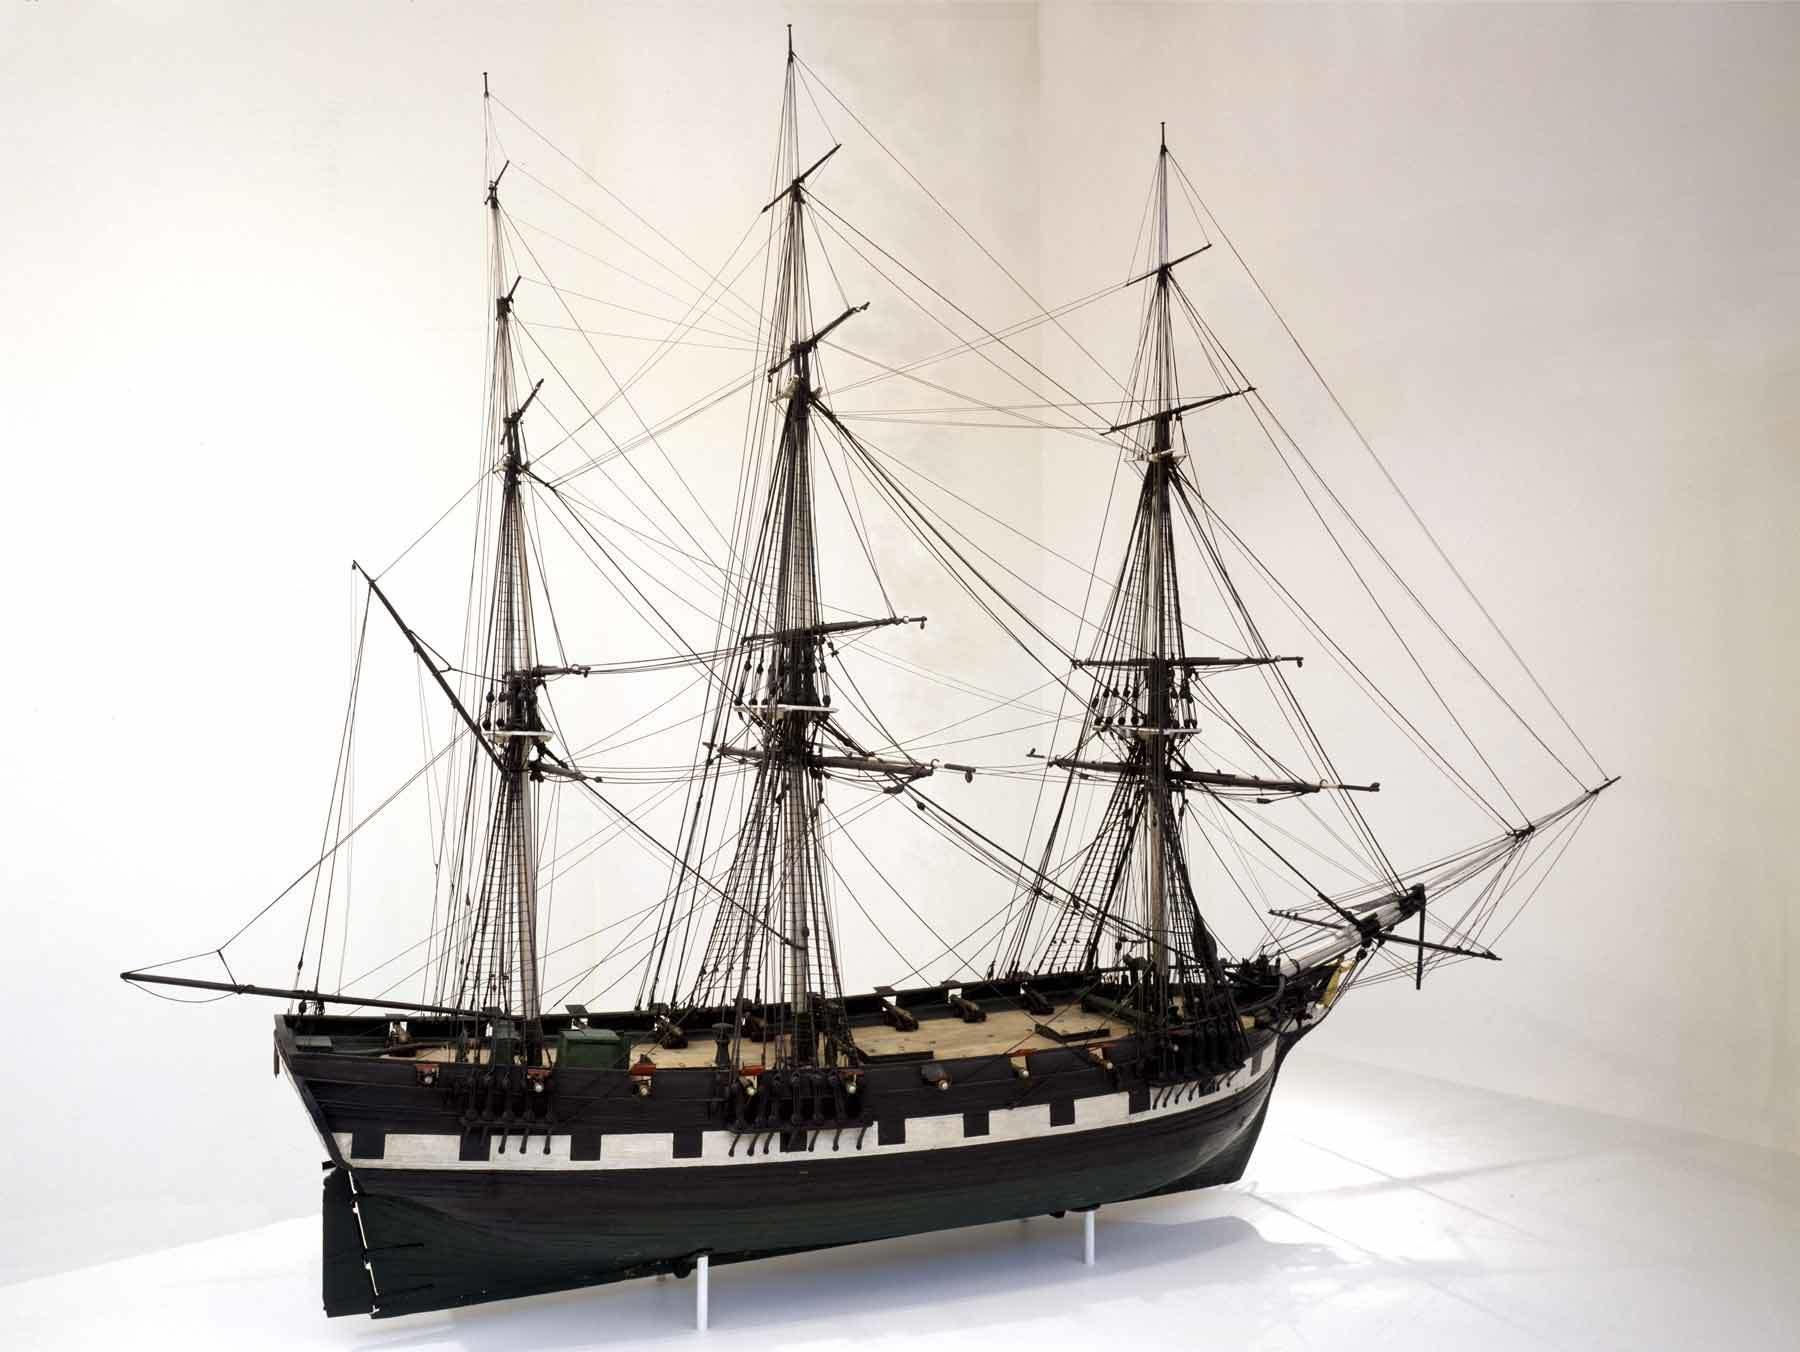 Mr. Odell (American); Thomas Russell (American), Full-hull model, ca. 1804